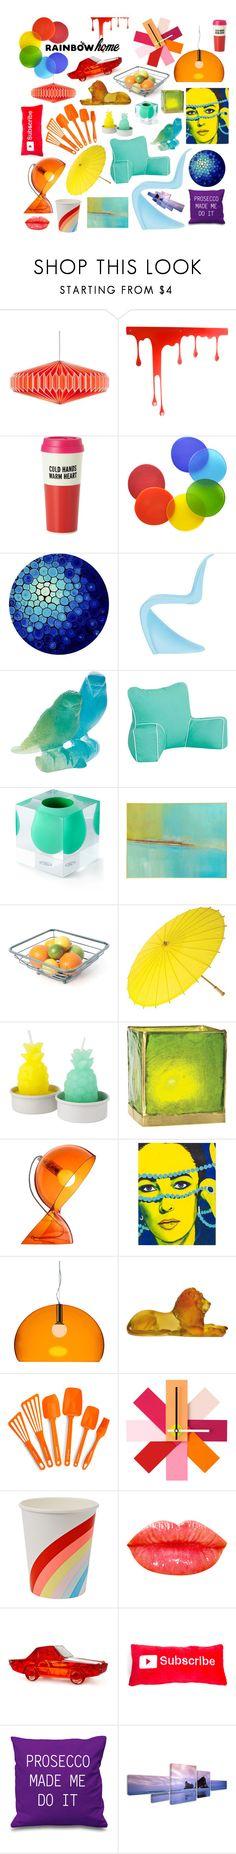 """Rainbow!"" by metropulse on Polyvore featuring interior, interiors, interior design, home, home decor, interior decorating, Pulpo, Kate Spade, Tina Frey Designs and Vitra"